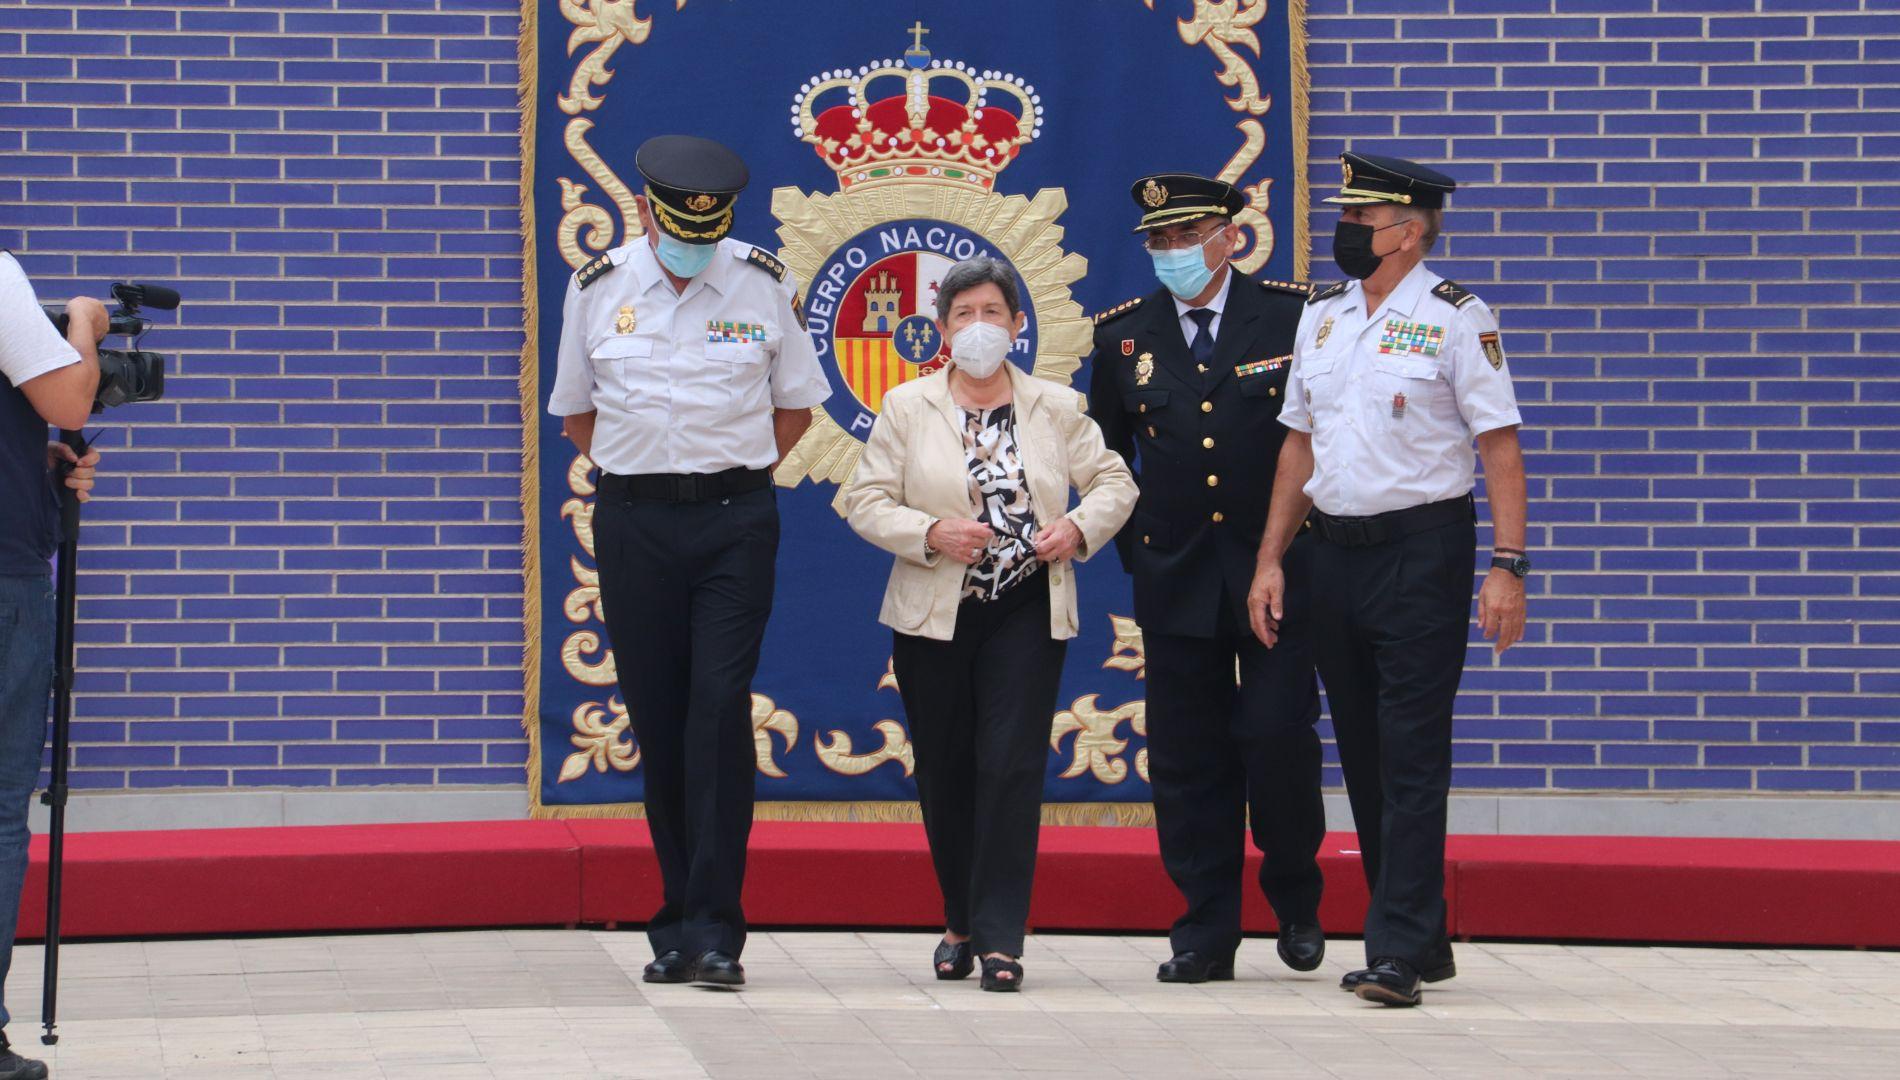 El nou comissari en cap de la Policia Nacional de Barcelona, José Dos Santos Gay i la delegada del Govern espanyol, Teresa Cunillera